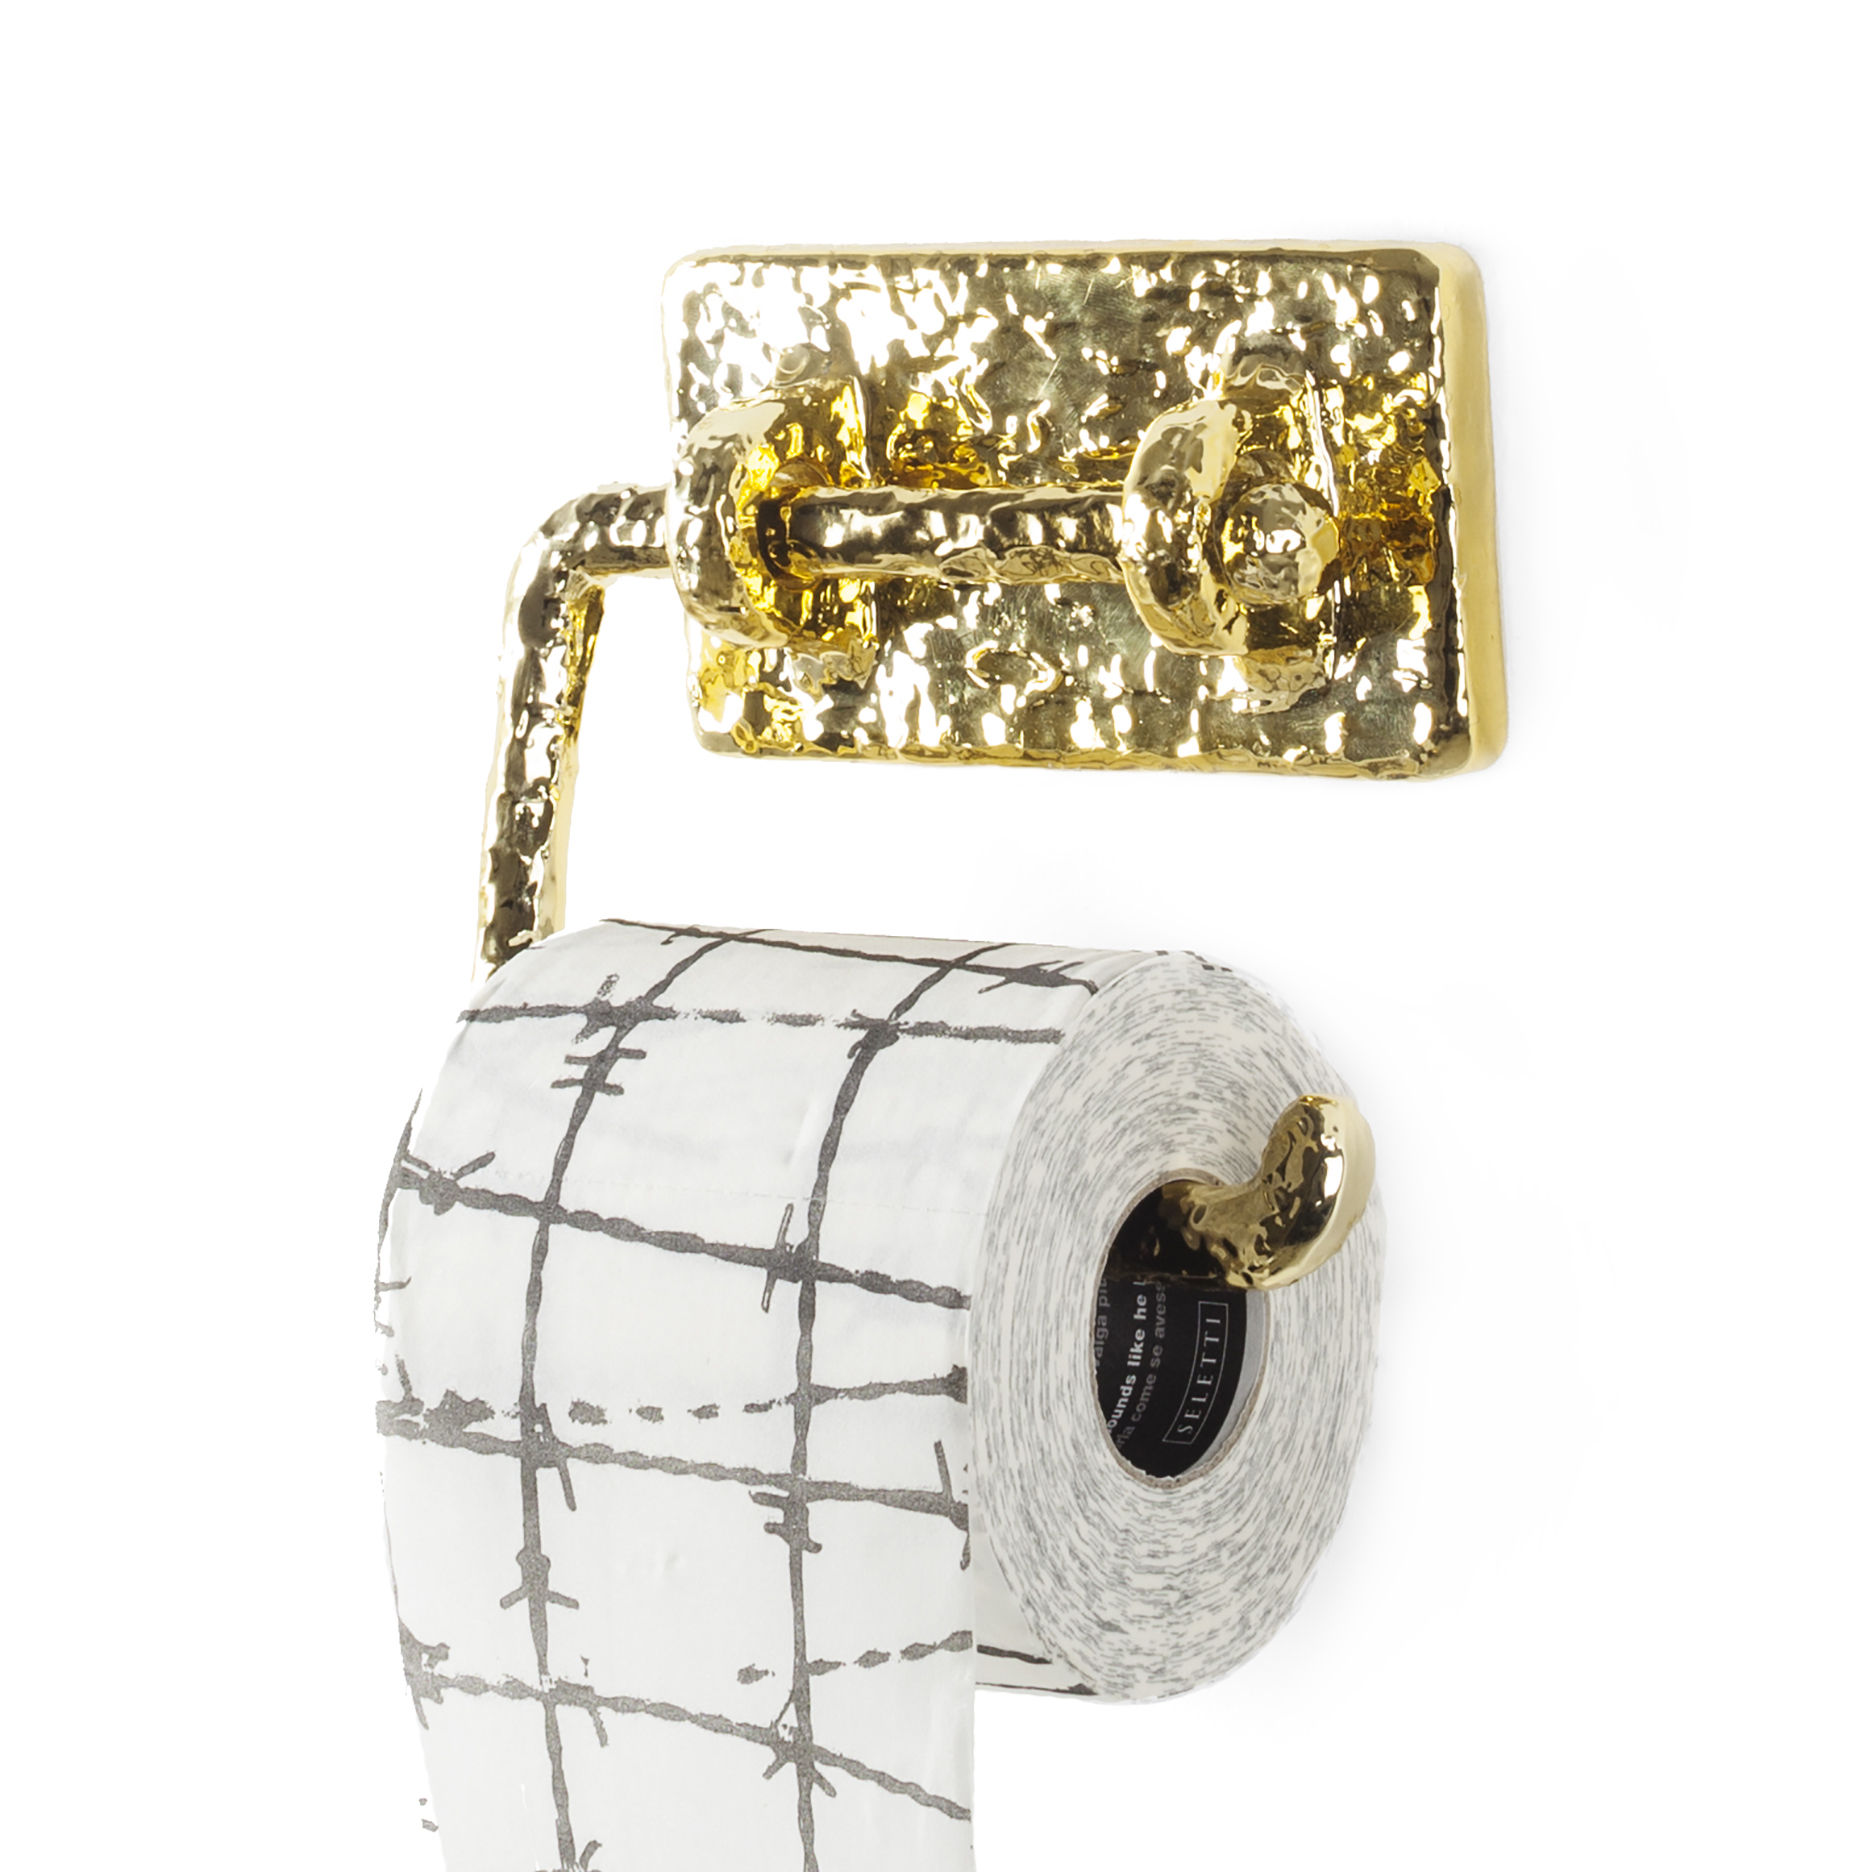 d rouleur de papier toilette maurizi or laiton seletti made in design. Black Bedroom Furniture Sets. Home Design Ideas